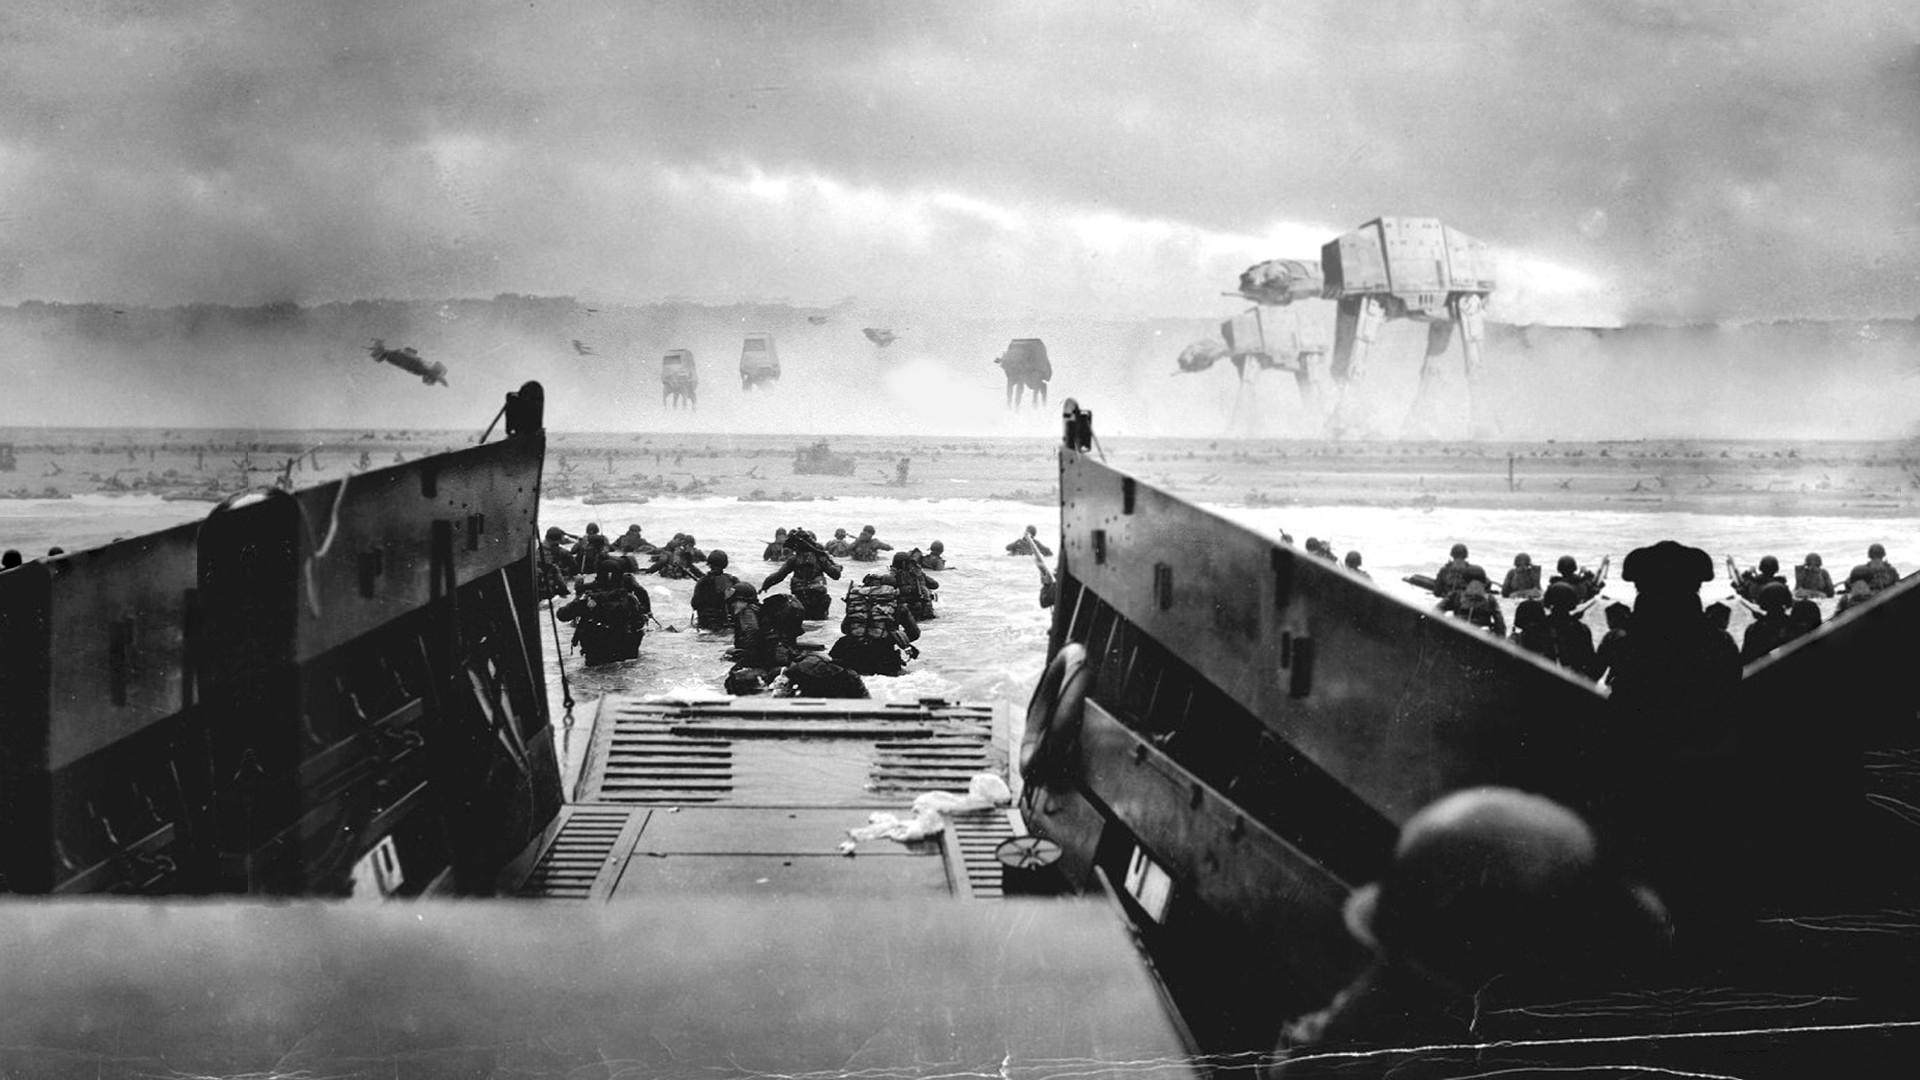 world war ii wallpapers - album on imgur